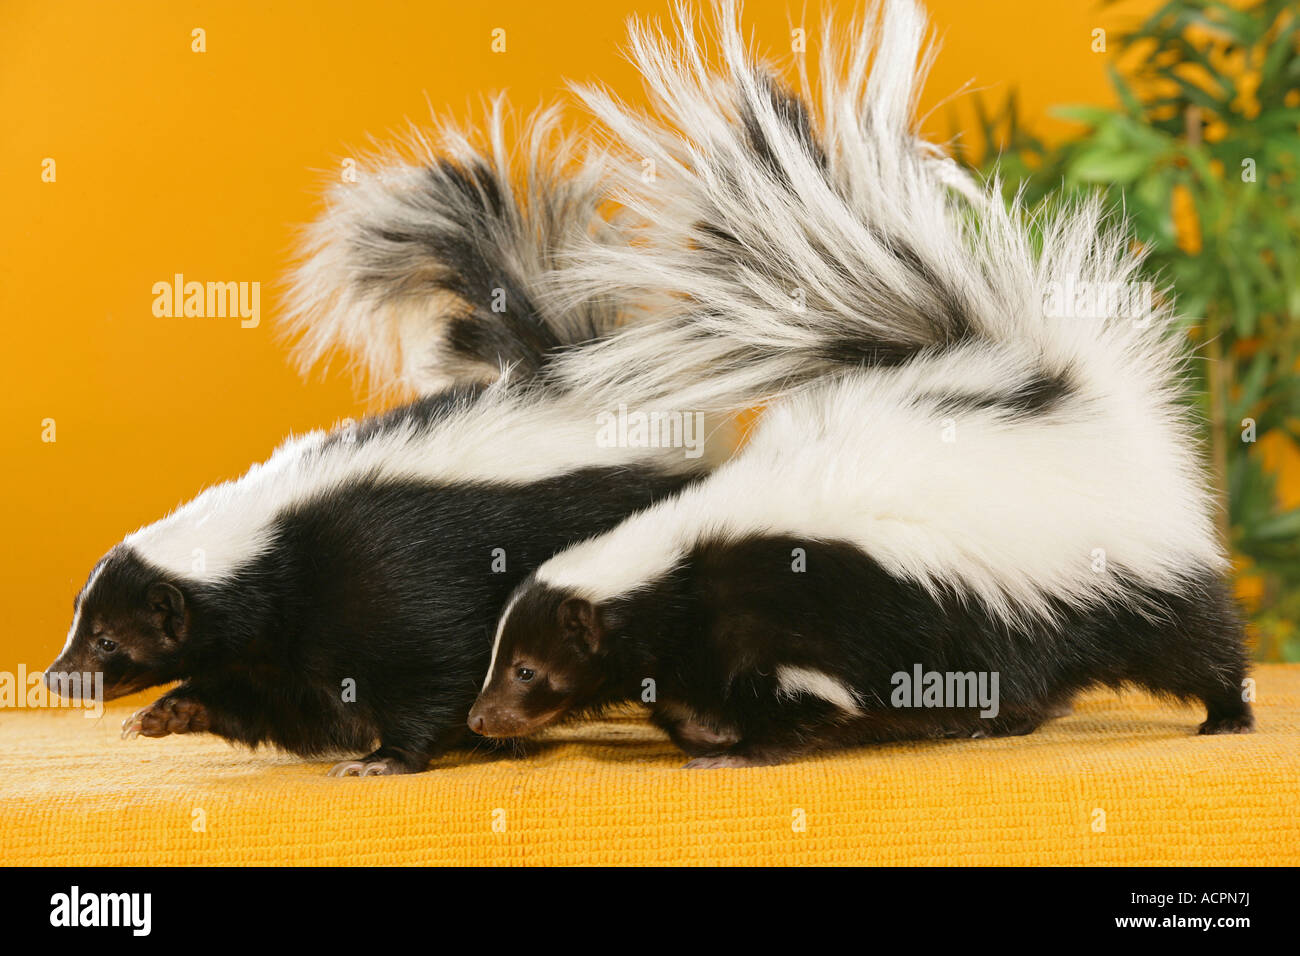 two skunks stock photo royalty free image 13209701 alamy